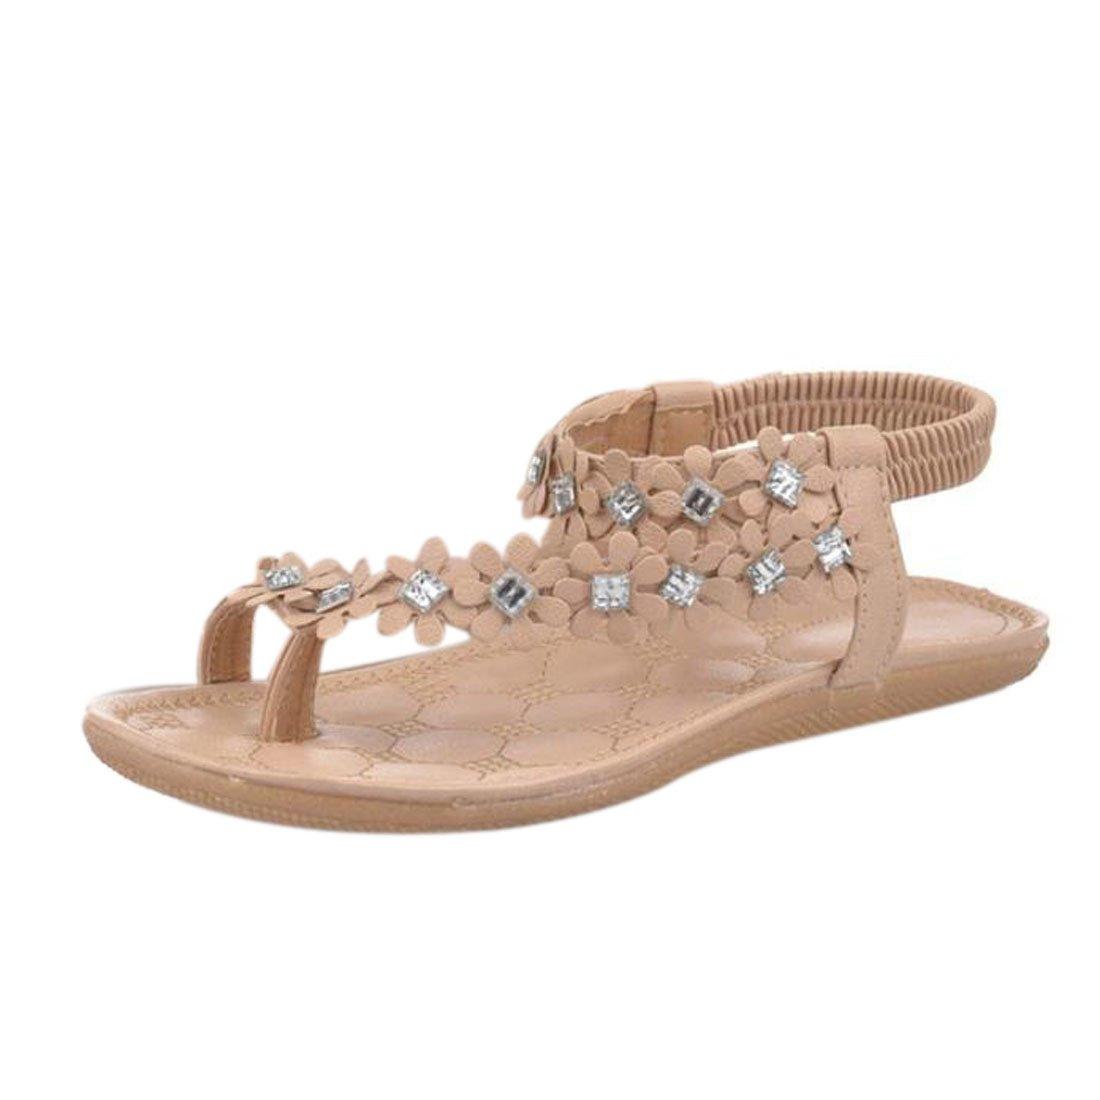 Damen Sommer Schuhe Xinan Bouml;hmen Blumen Flip Flop Sandalen  39|Khaki